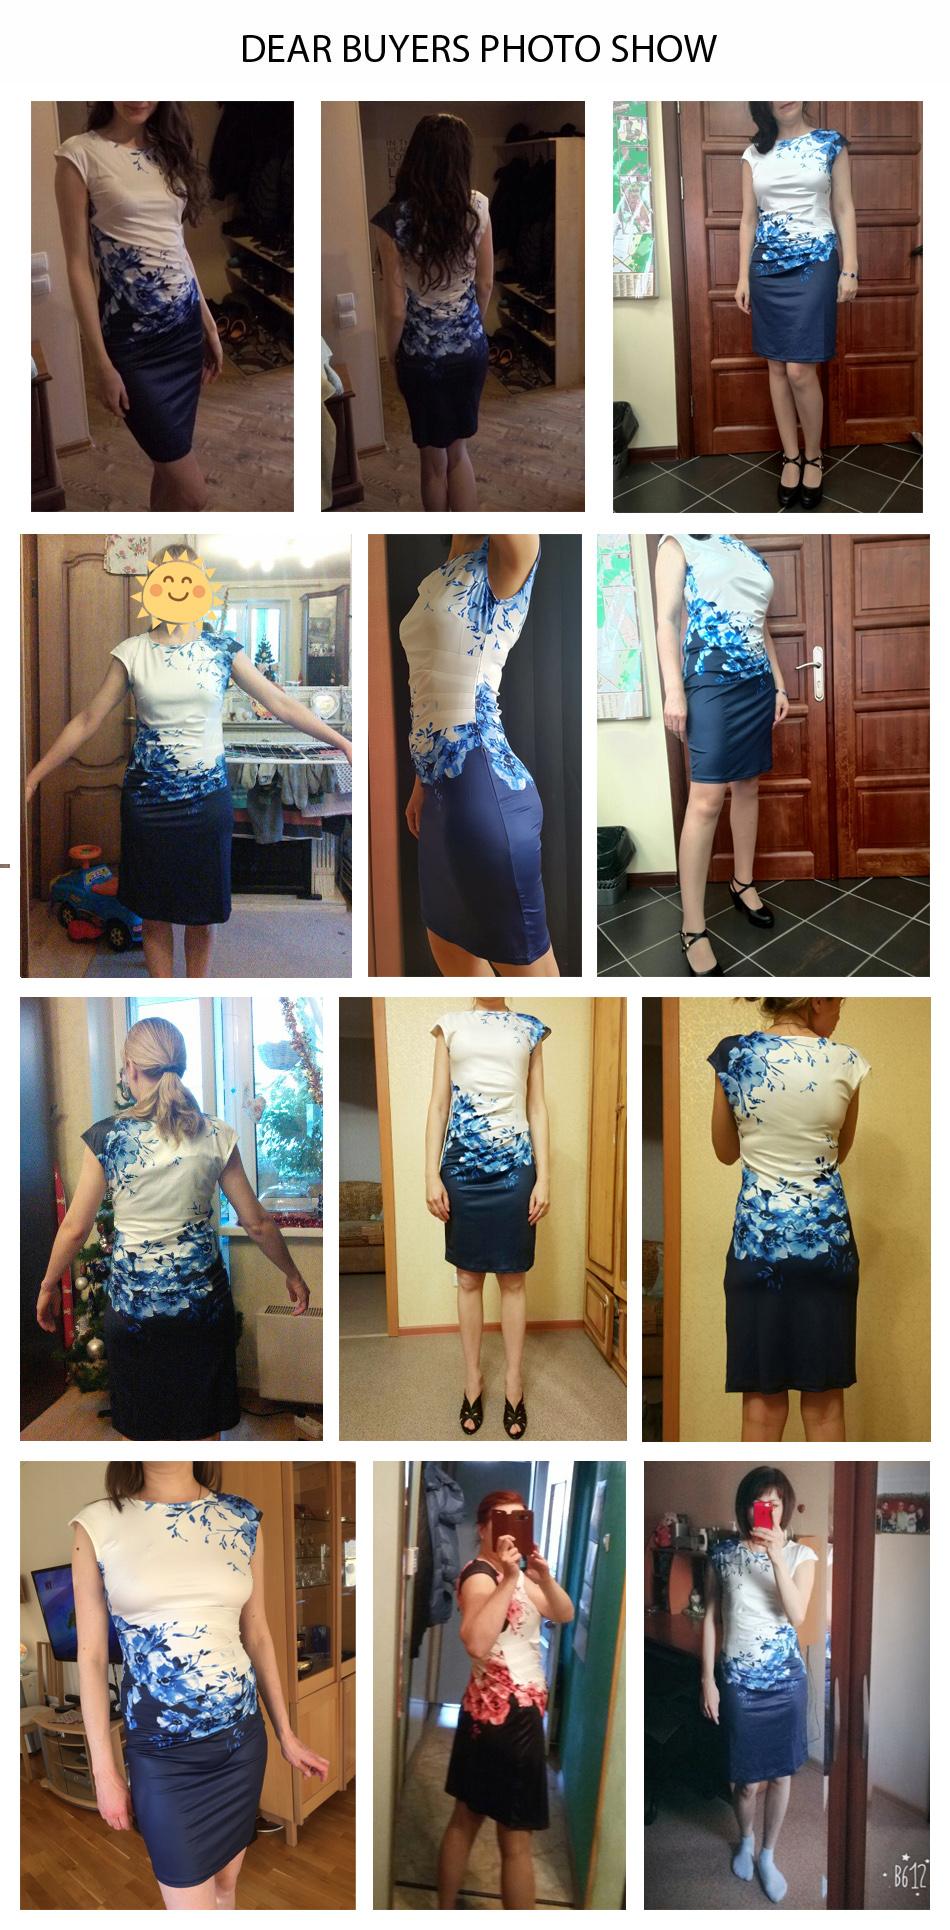 17 Kaige Nina dress Women bodycon dress plus size women clothing chic elegant sexy fashion o-neck print dresses 9026 18